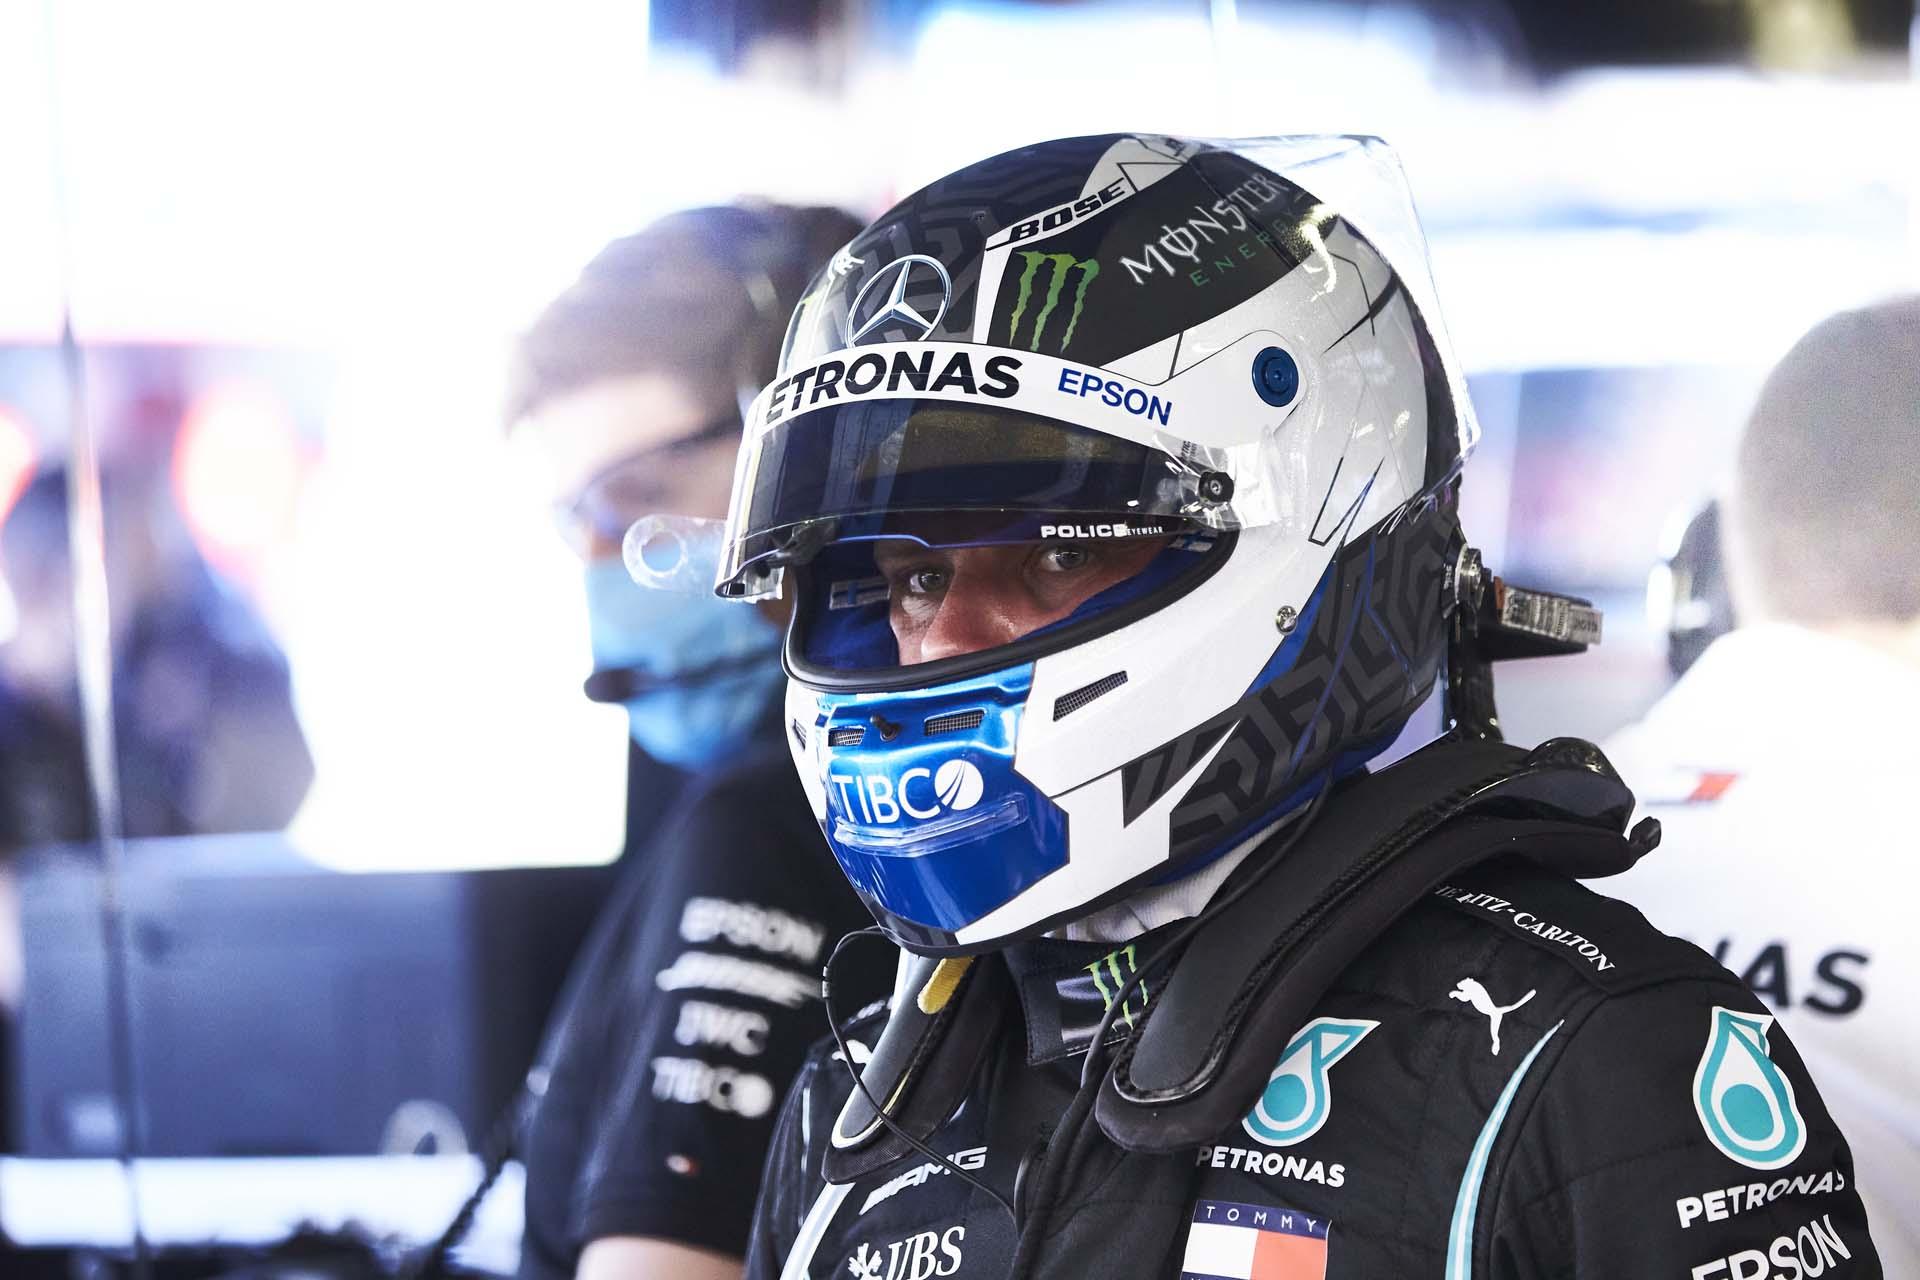 2020 British Grand Prix, Friday - Steve Etherington